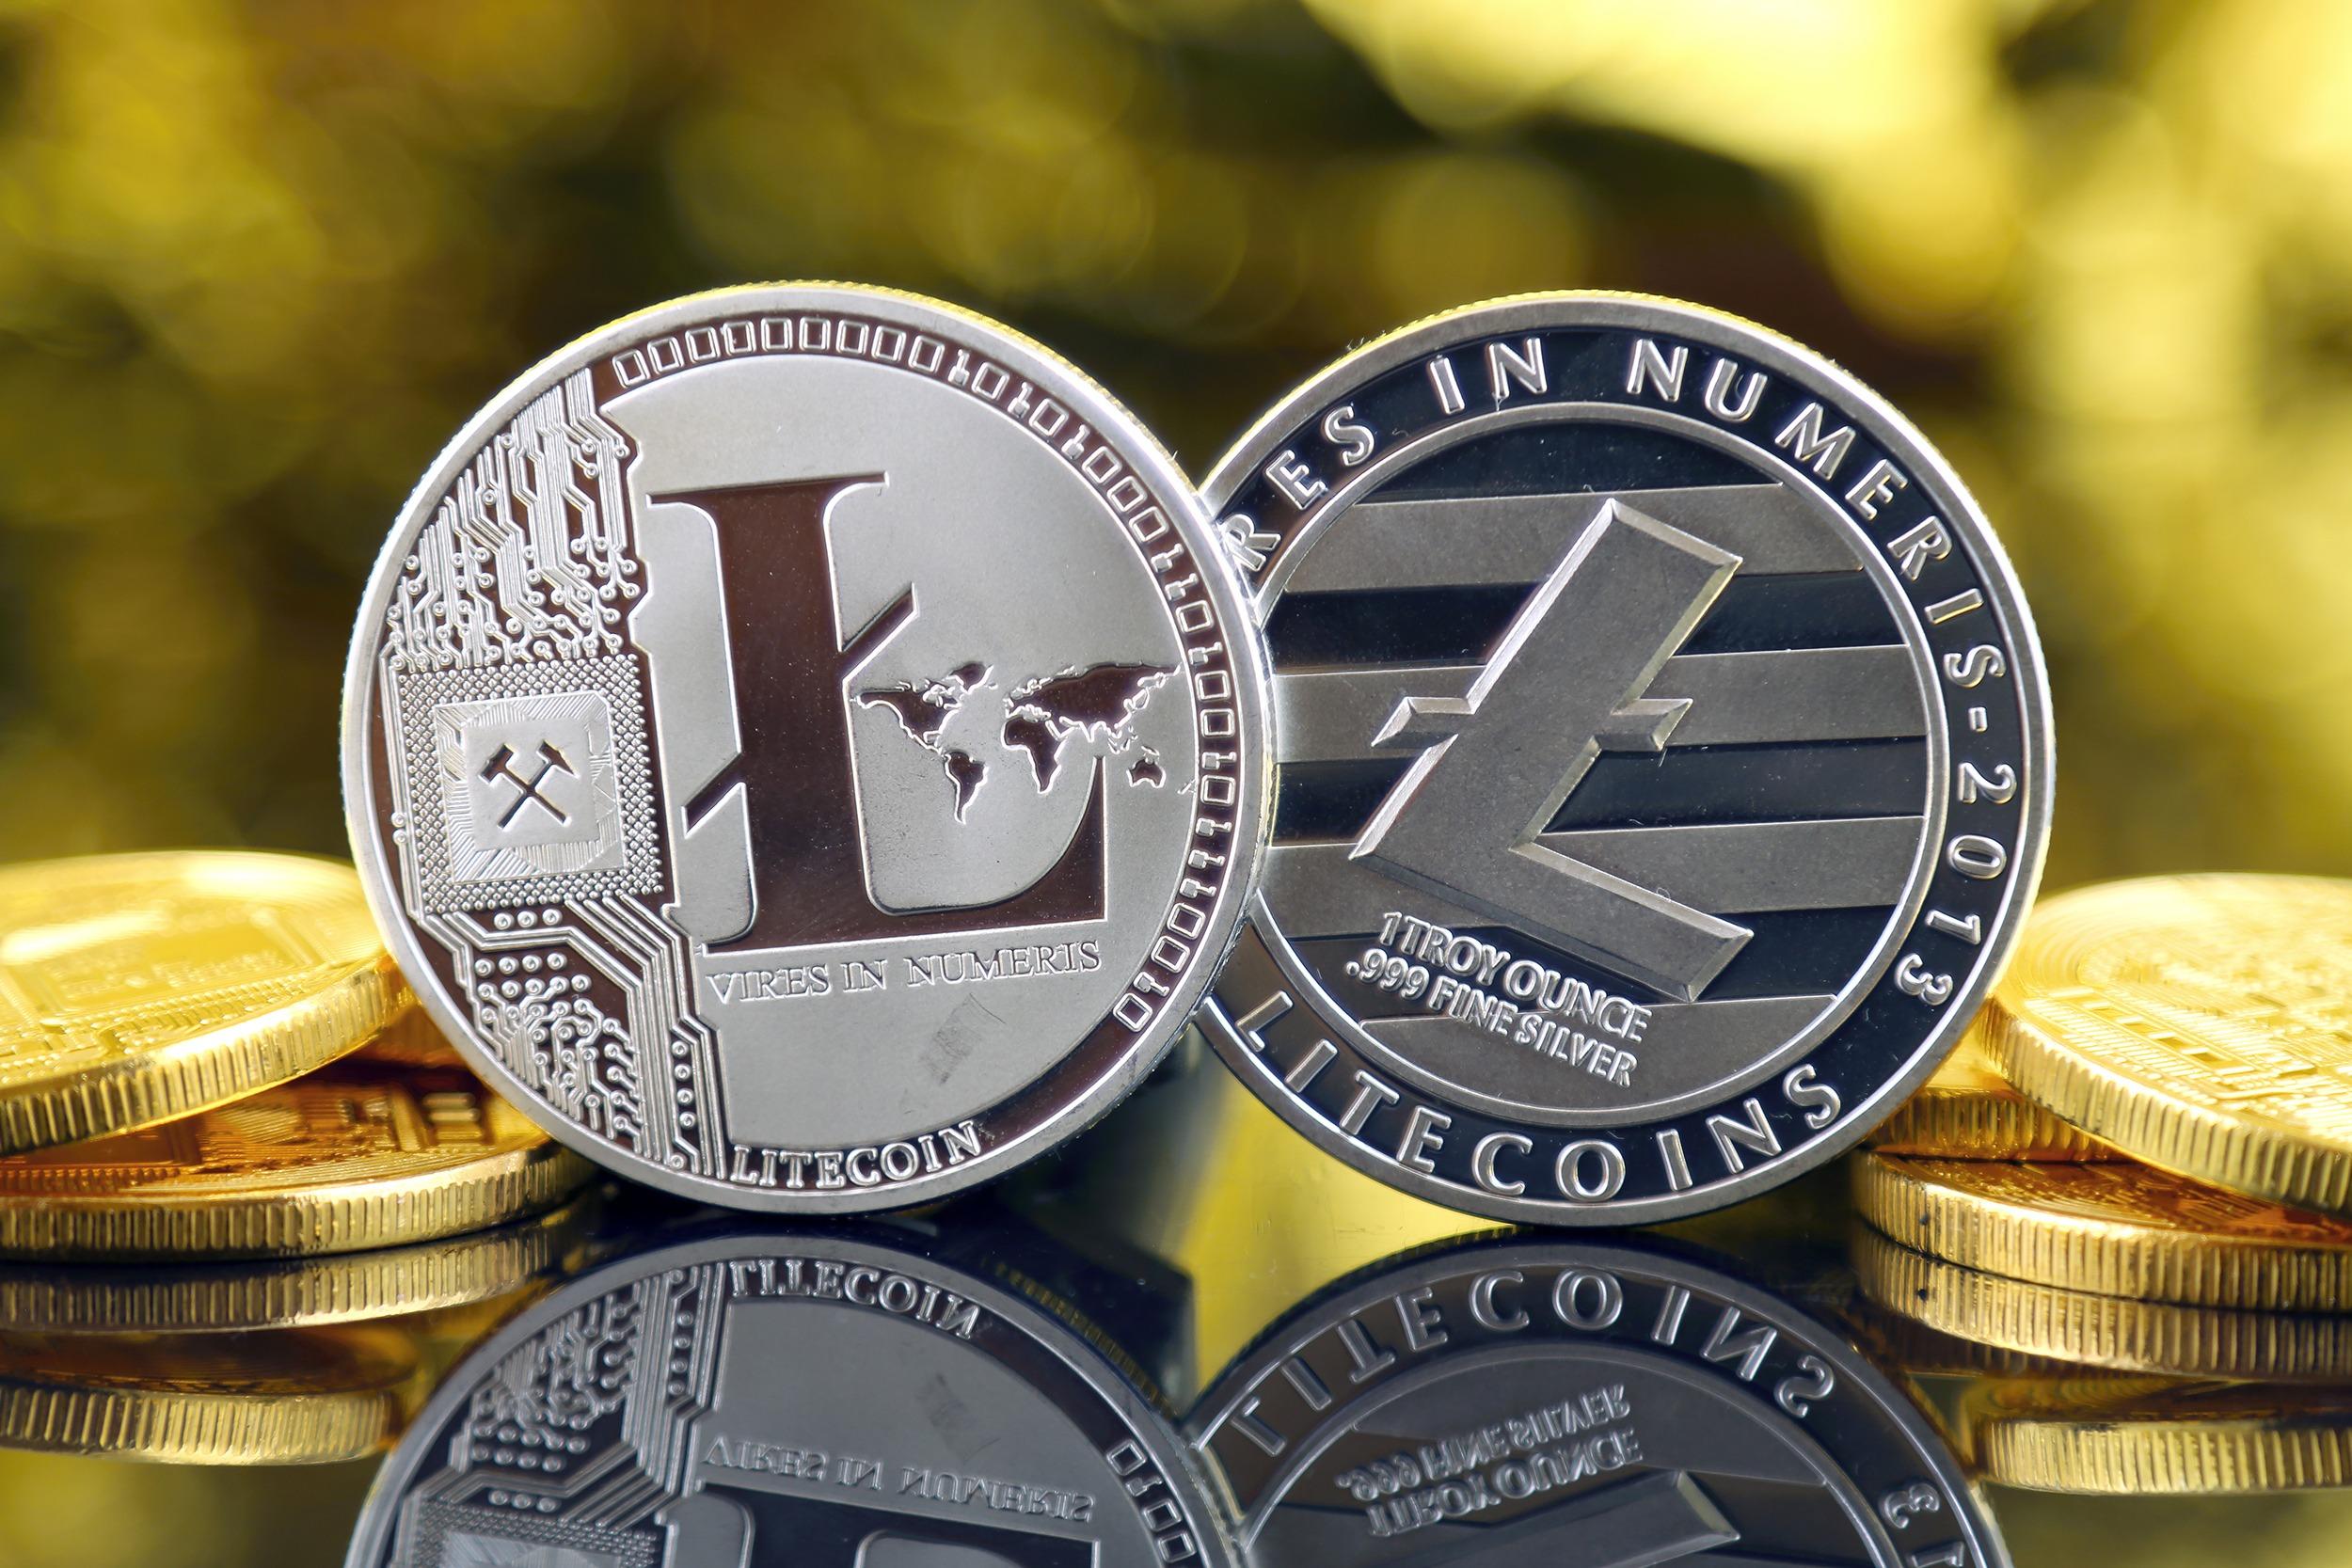 Will Litecoinbecome a second bitcoin?